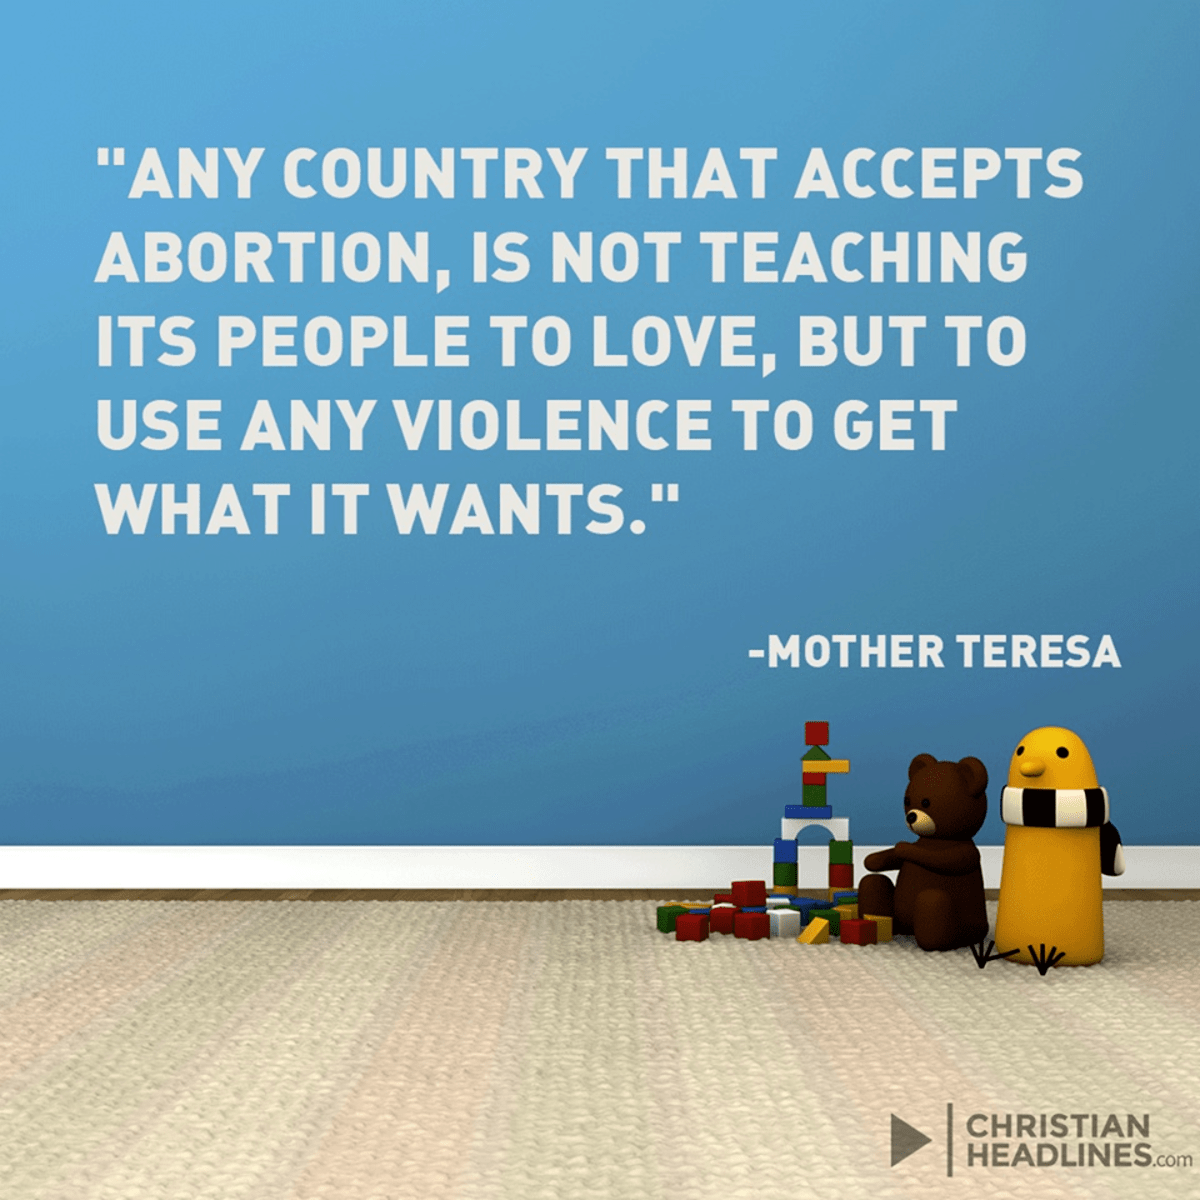 Mother Teresa on Abortion